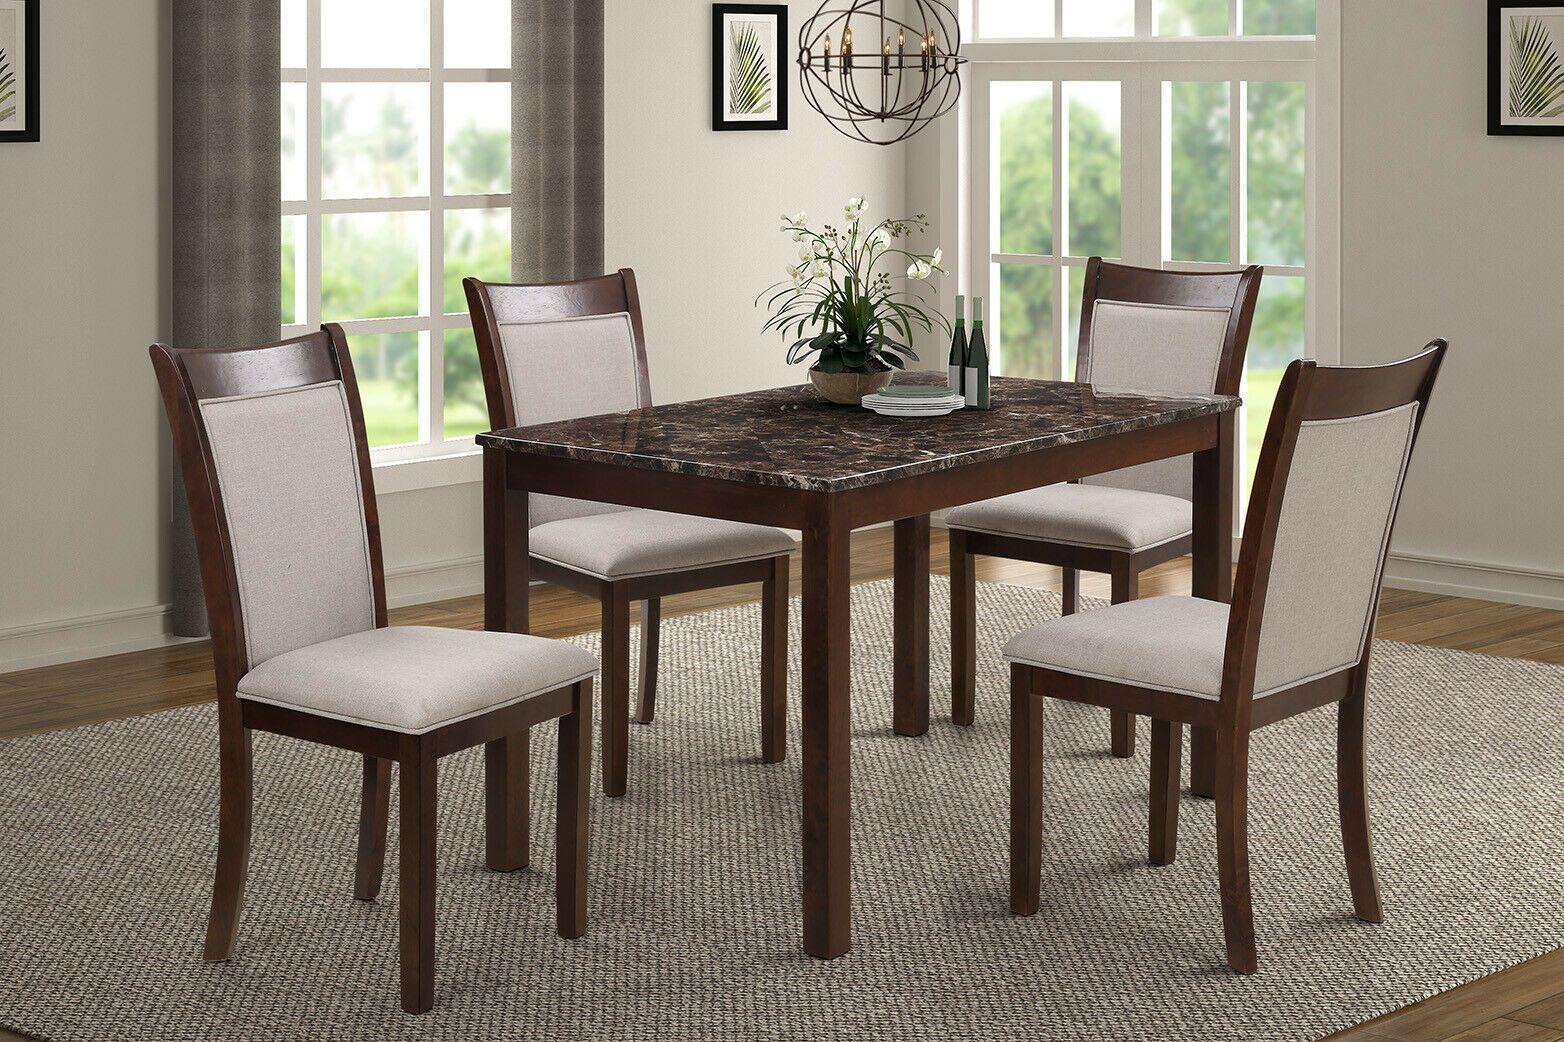 Https Ift Tt 2xwntzo Dining Table Ideas Of Dining Table Diningtable Table Dining Wood Dining Room Table Marble Tables Design Dining Room Table Set